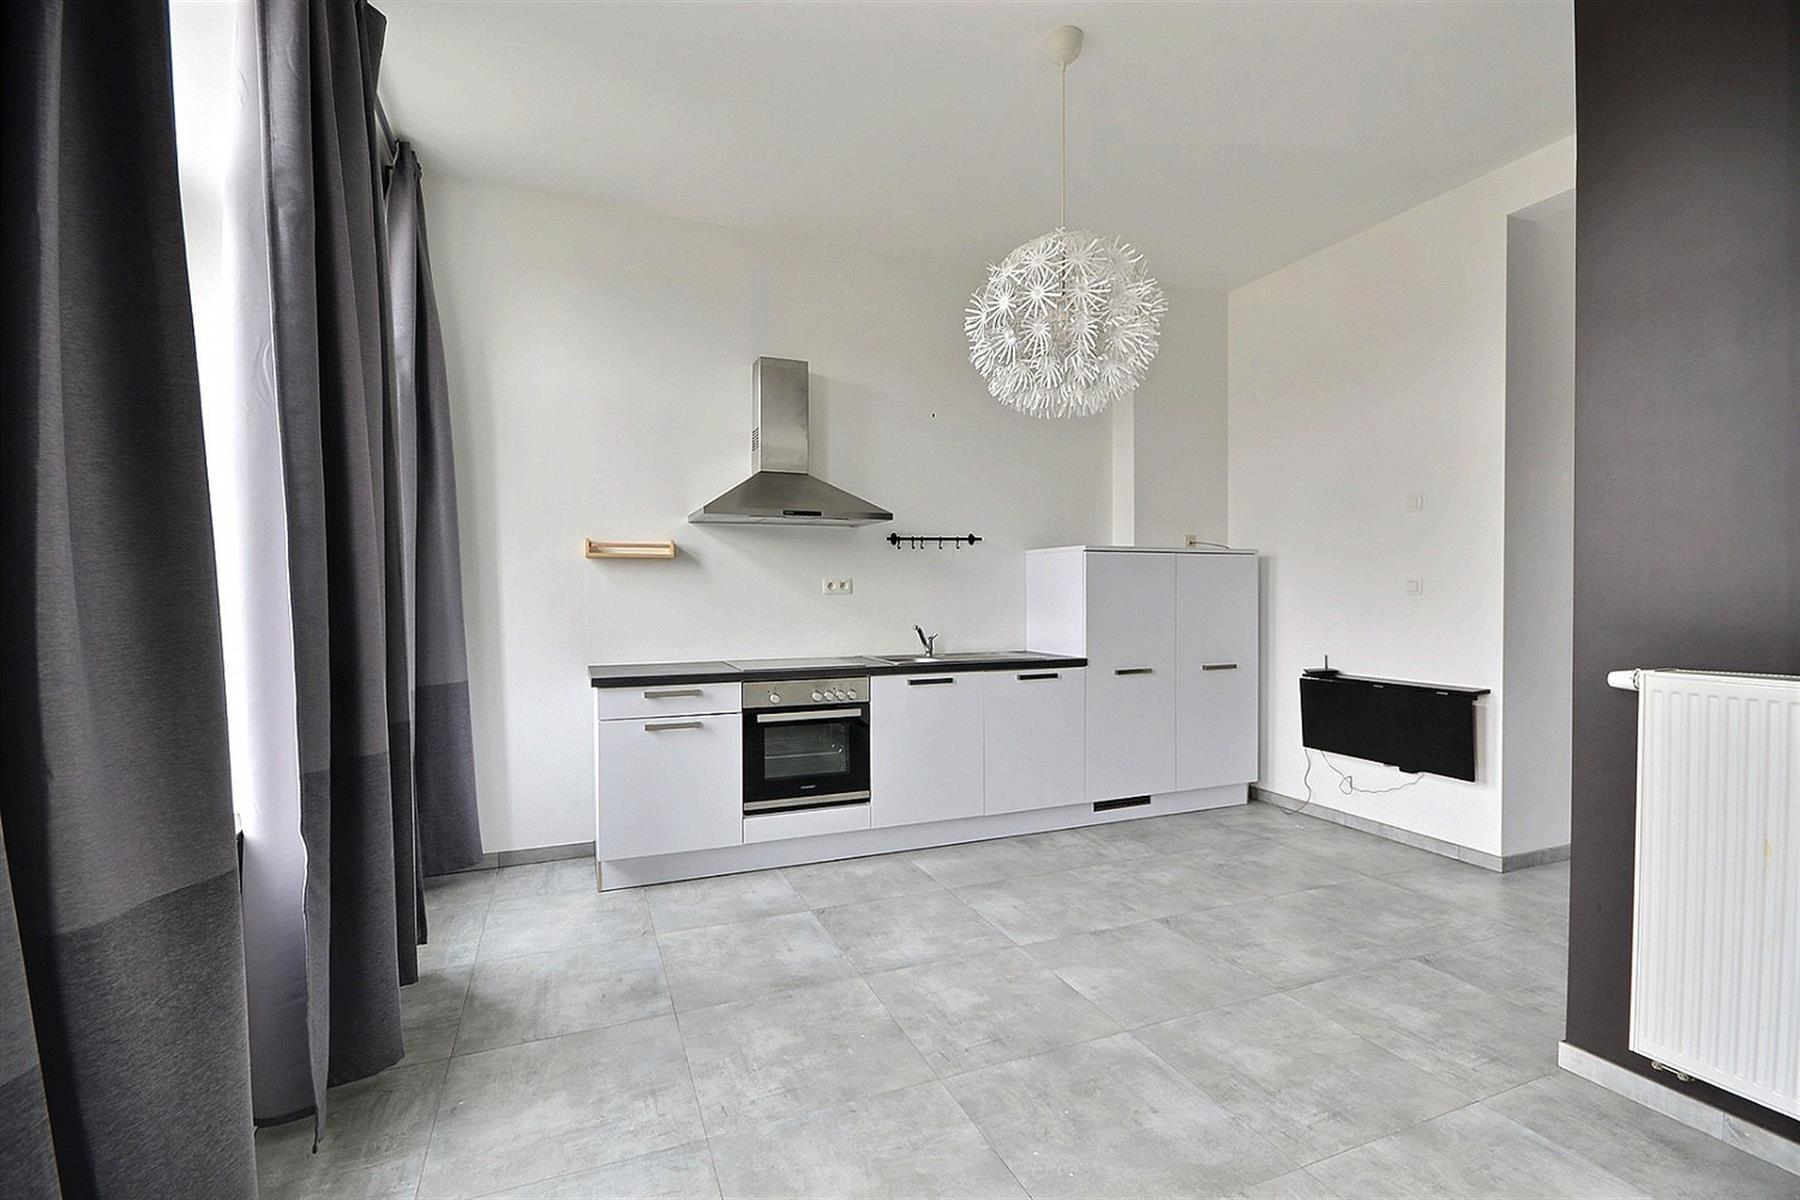 Appartement - LIÈGE - #4530417-2